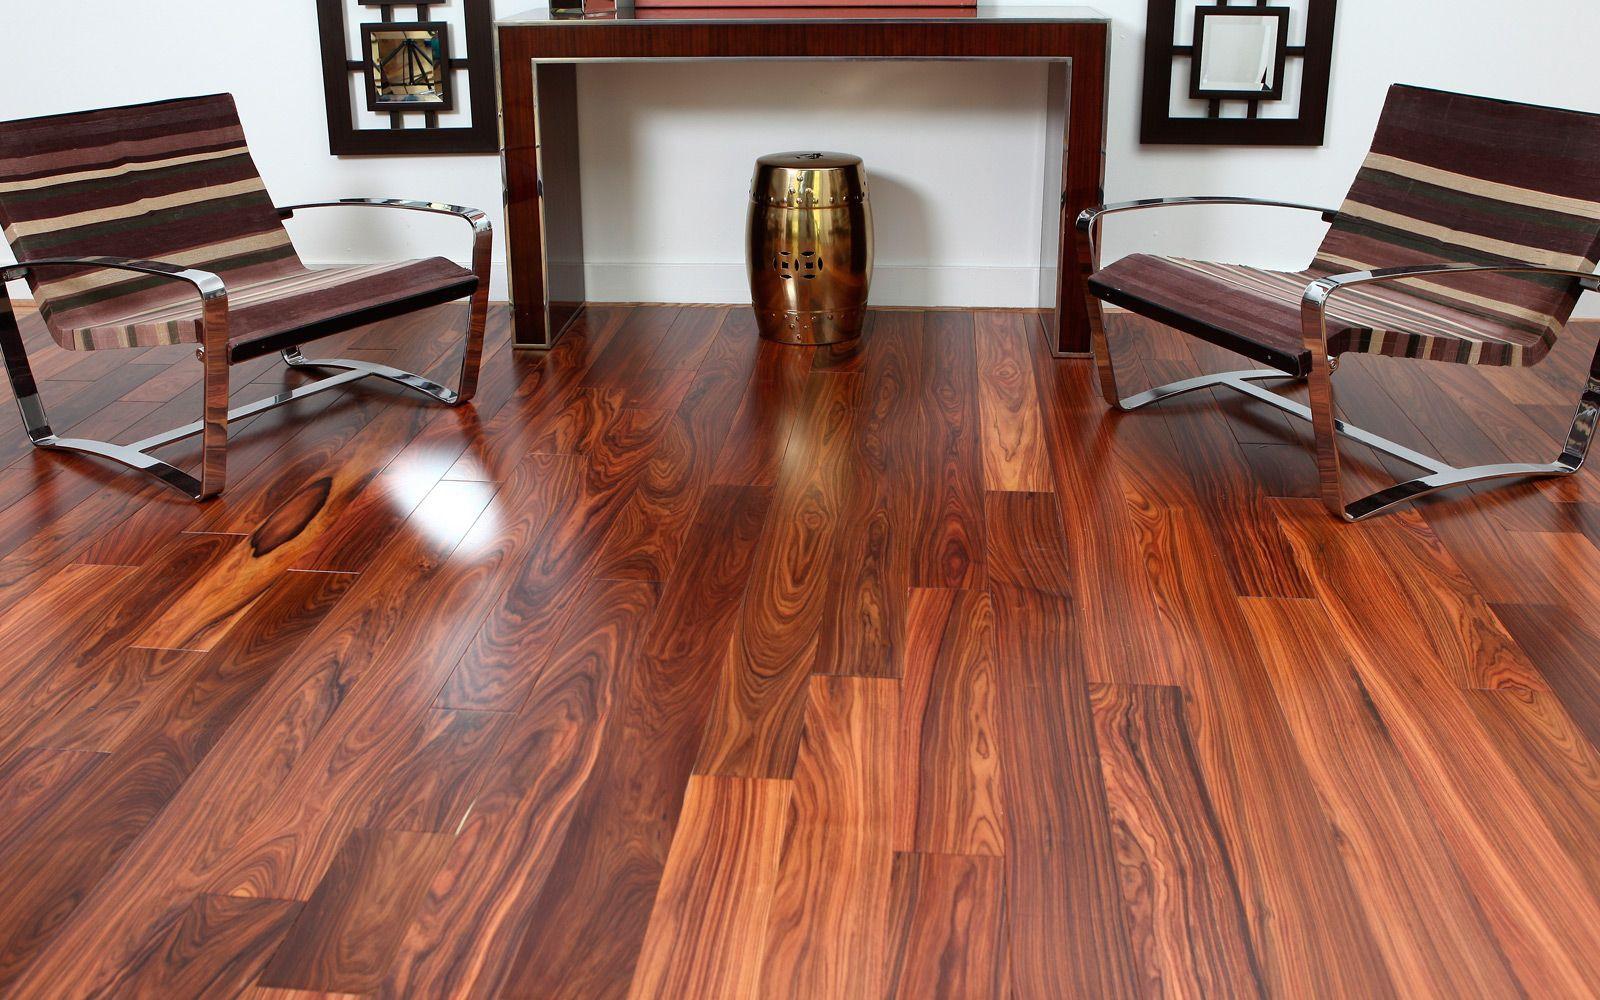 mohawk hardwood flooring dark auburn maple of bolivian rosewood has a deep rosewood like color with black striping in bolivian rosewood has a deep rosewood like color with black striping on top of a dark